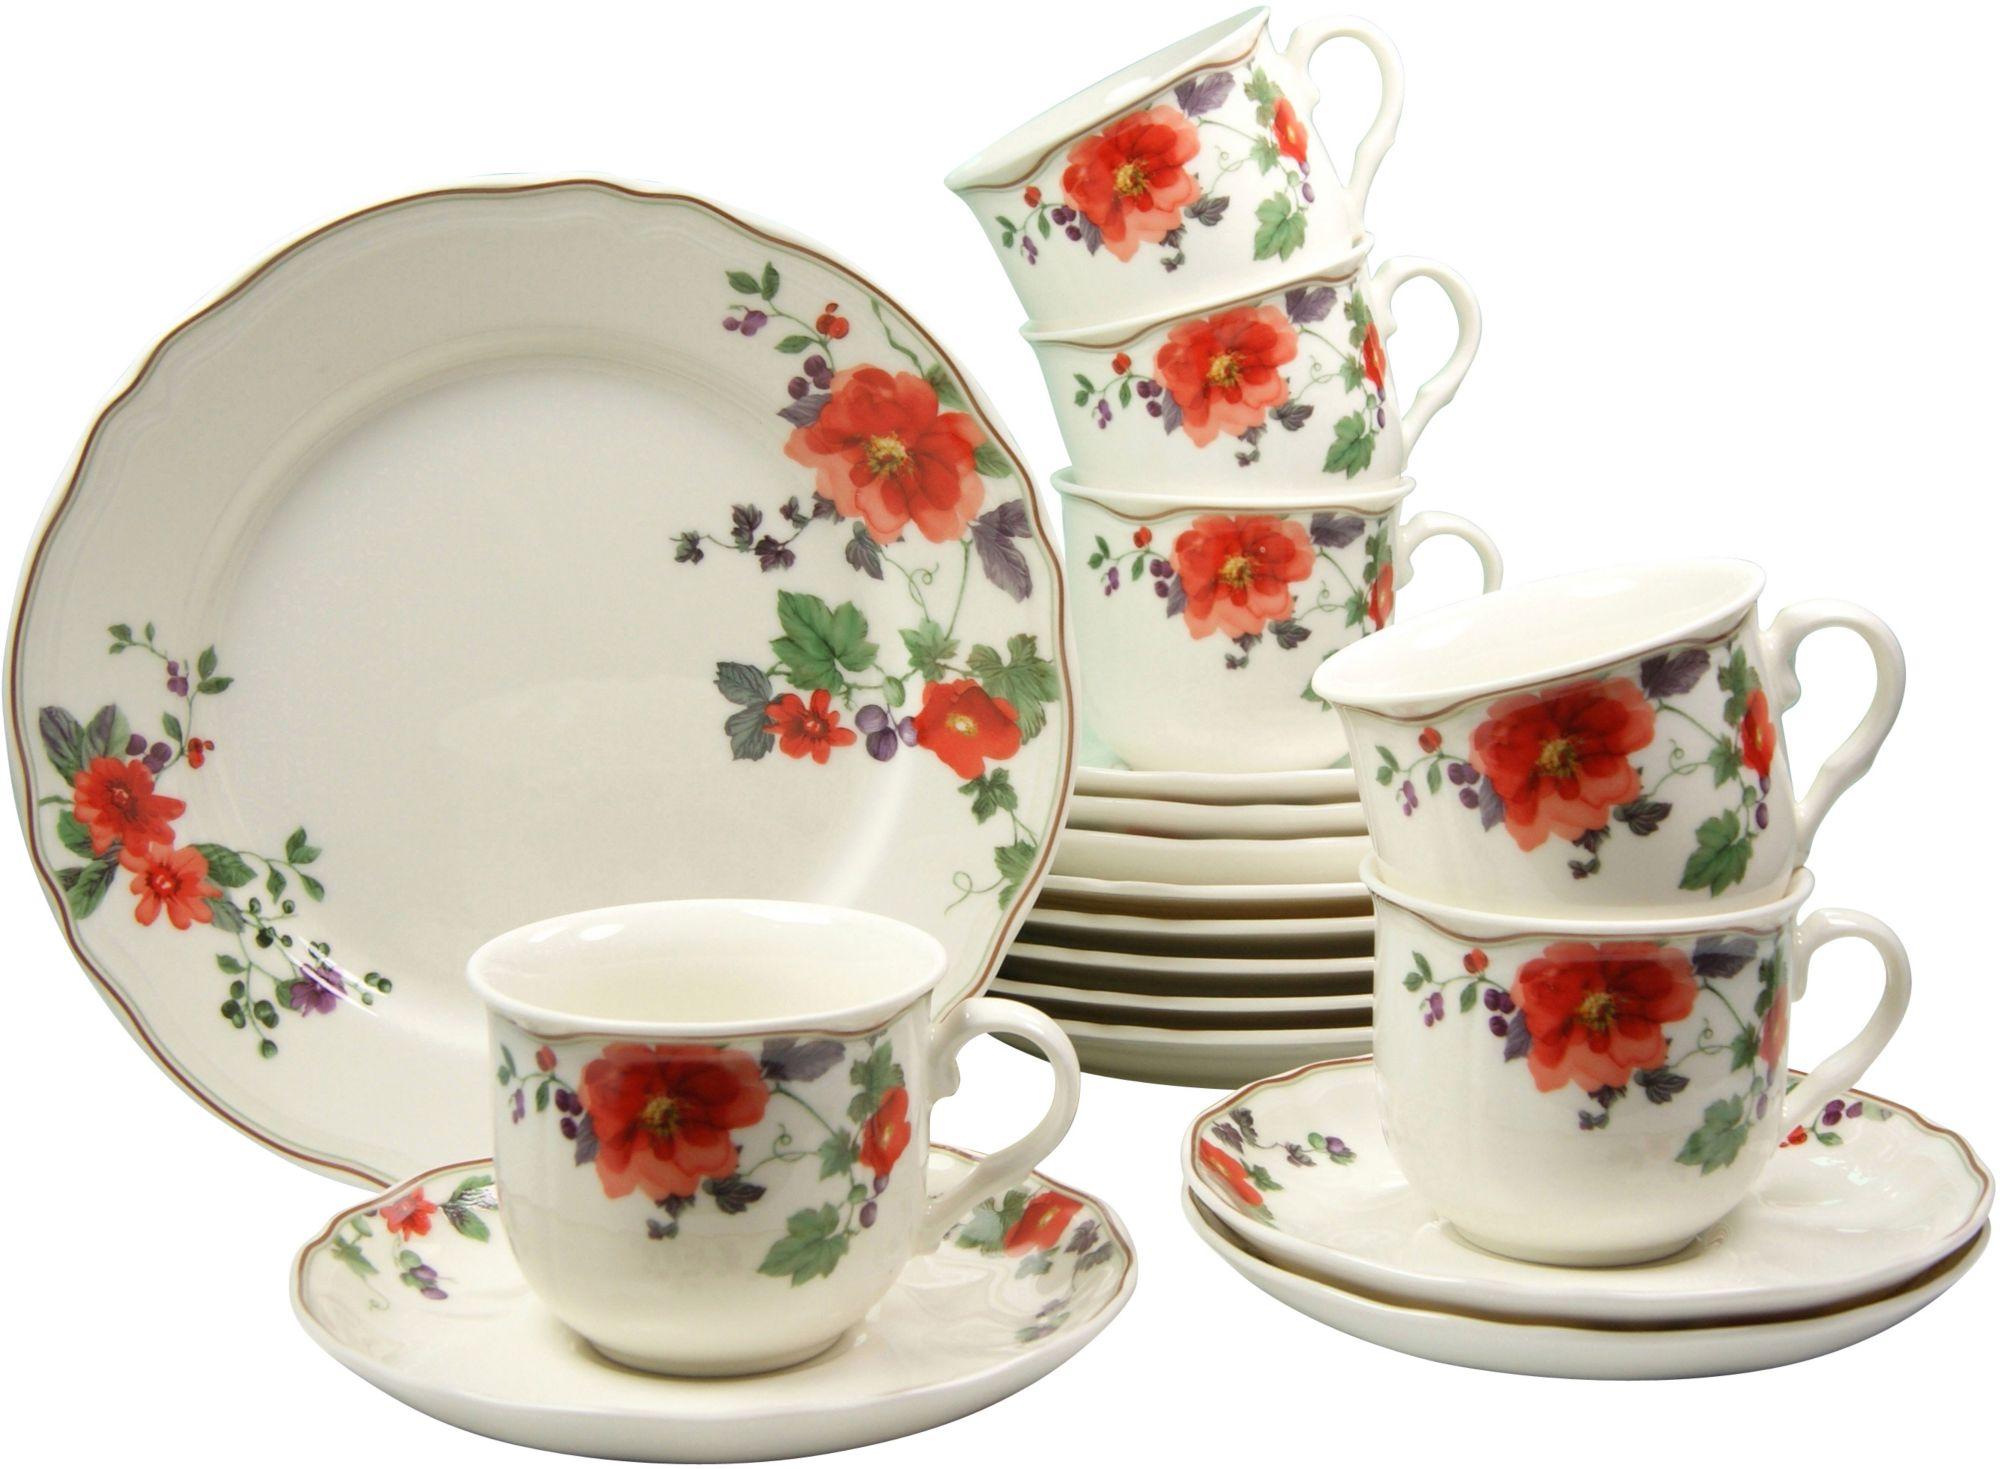 CREATABLE CreaTable Kaffeeservice, Premium Porzellan, 18 Teile, »MERAN«